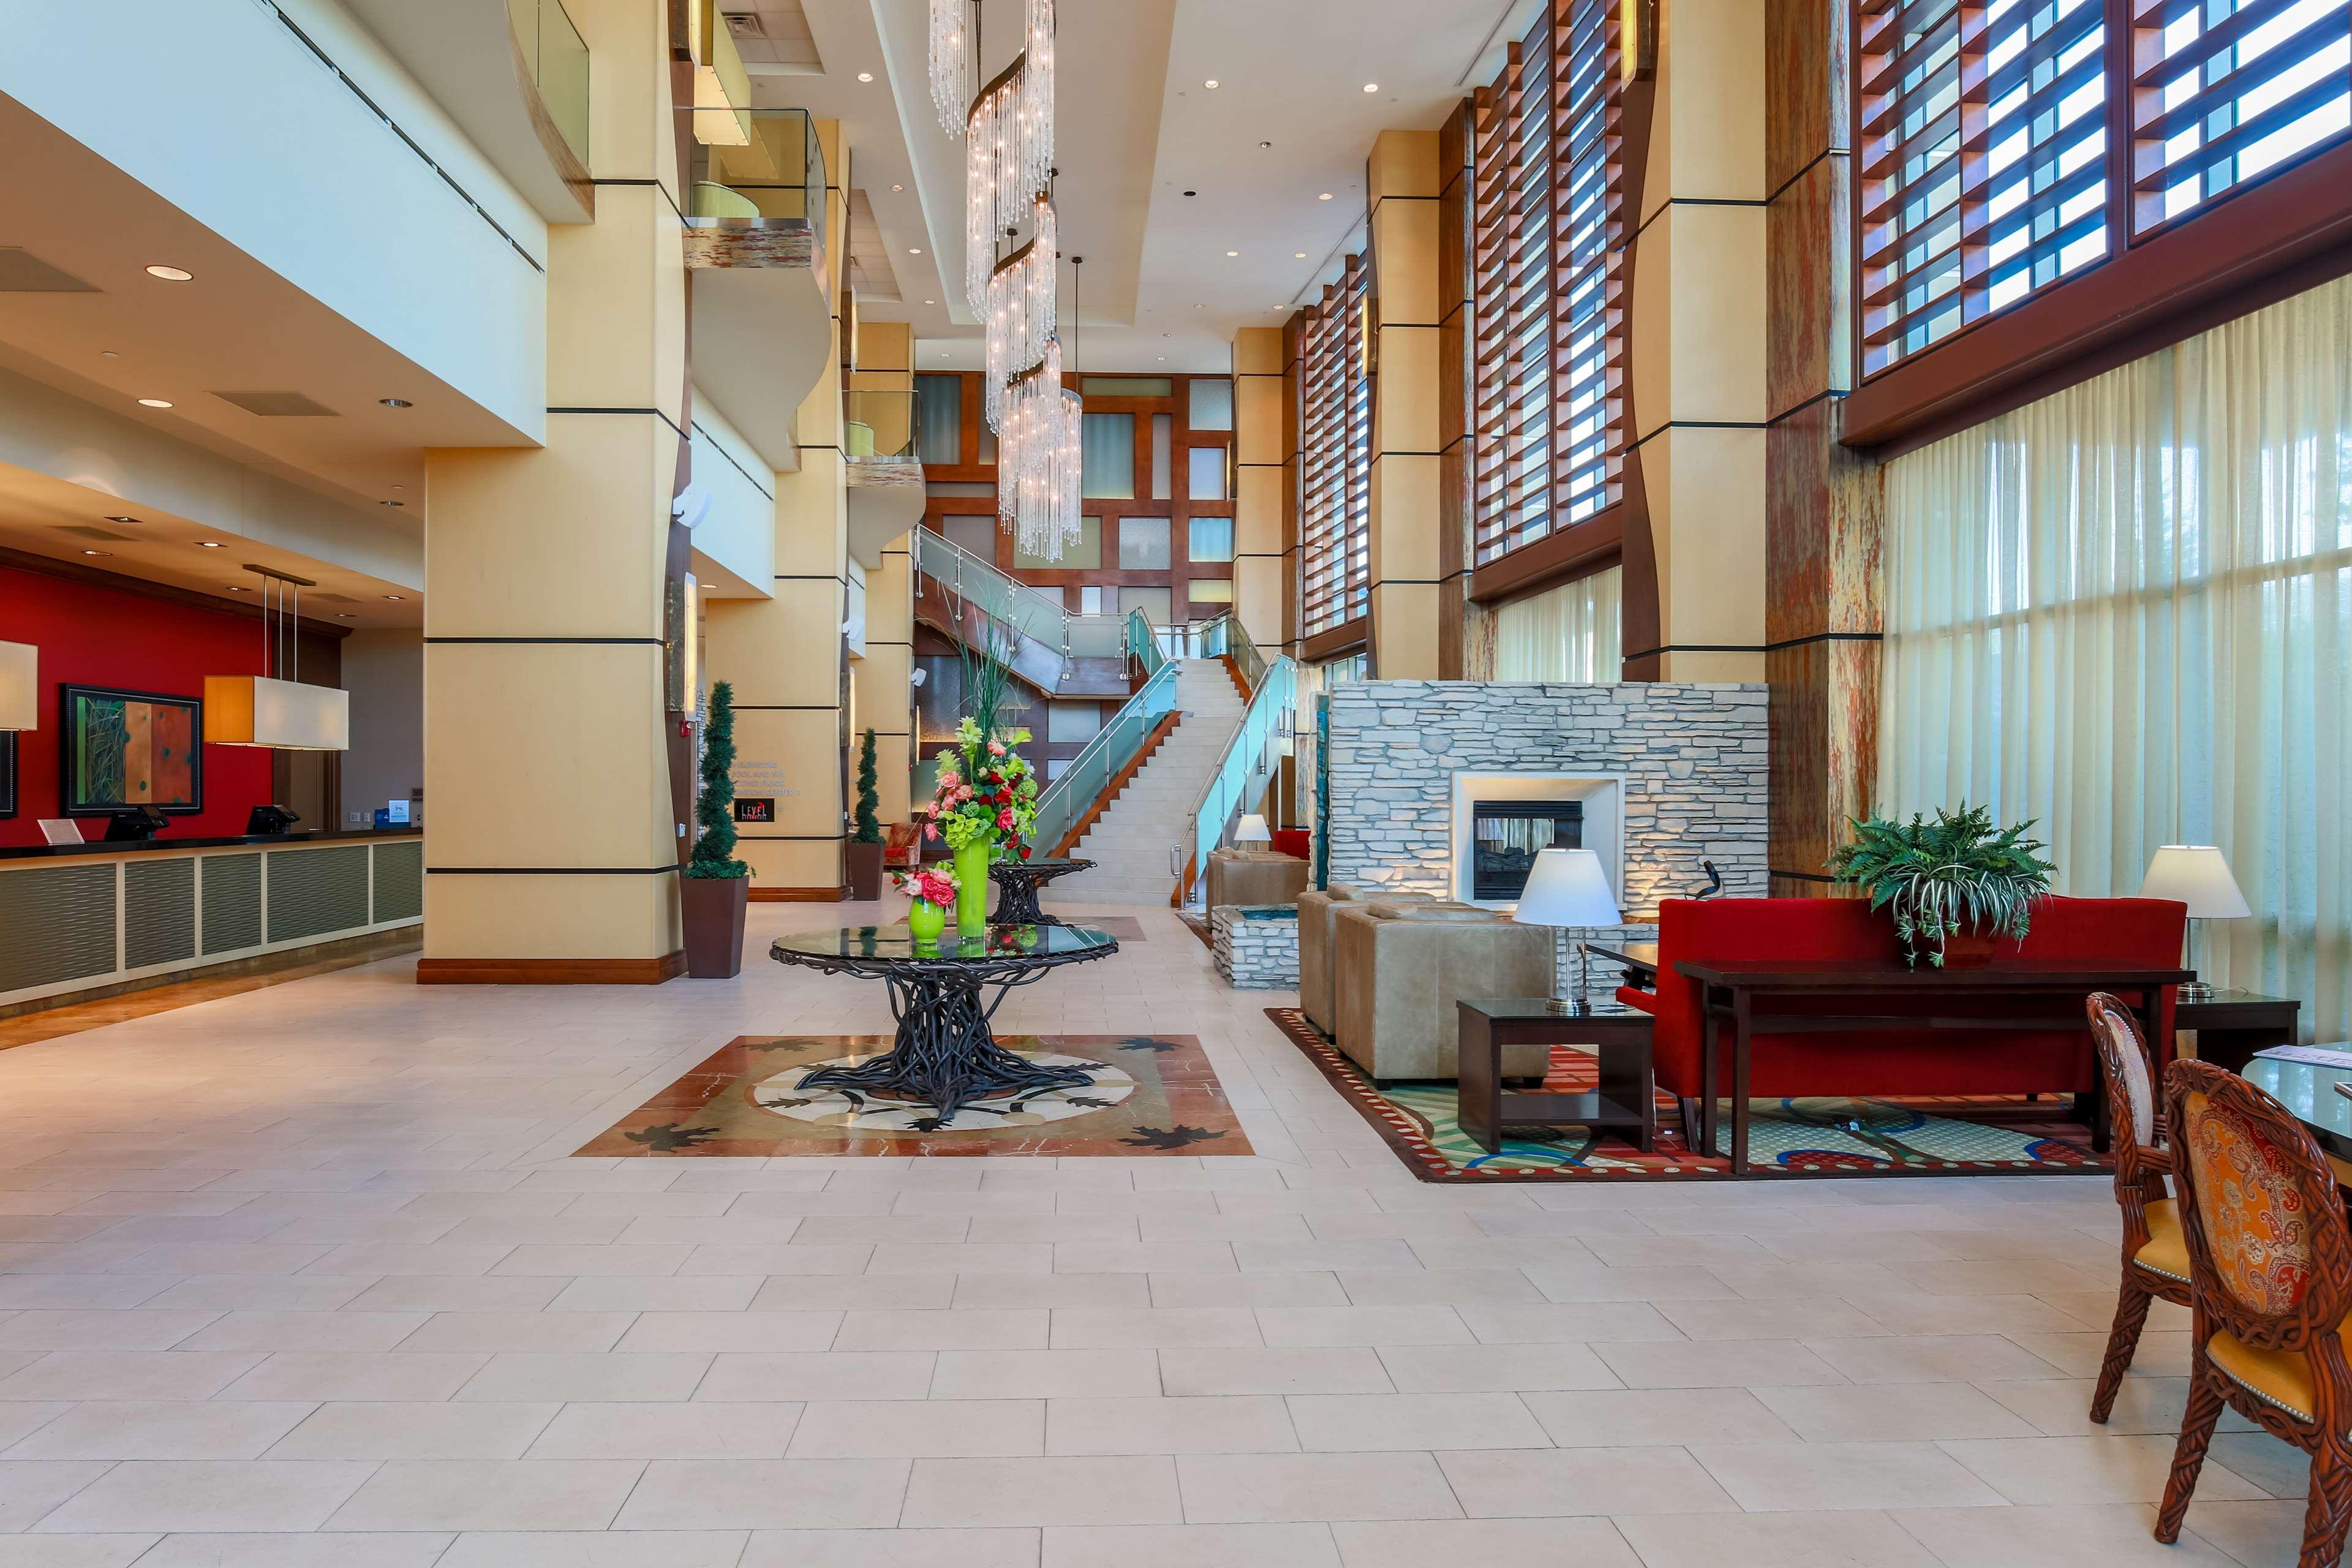 Hilton Branson Convention Center image 6